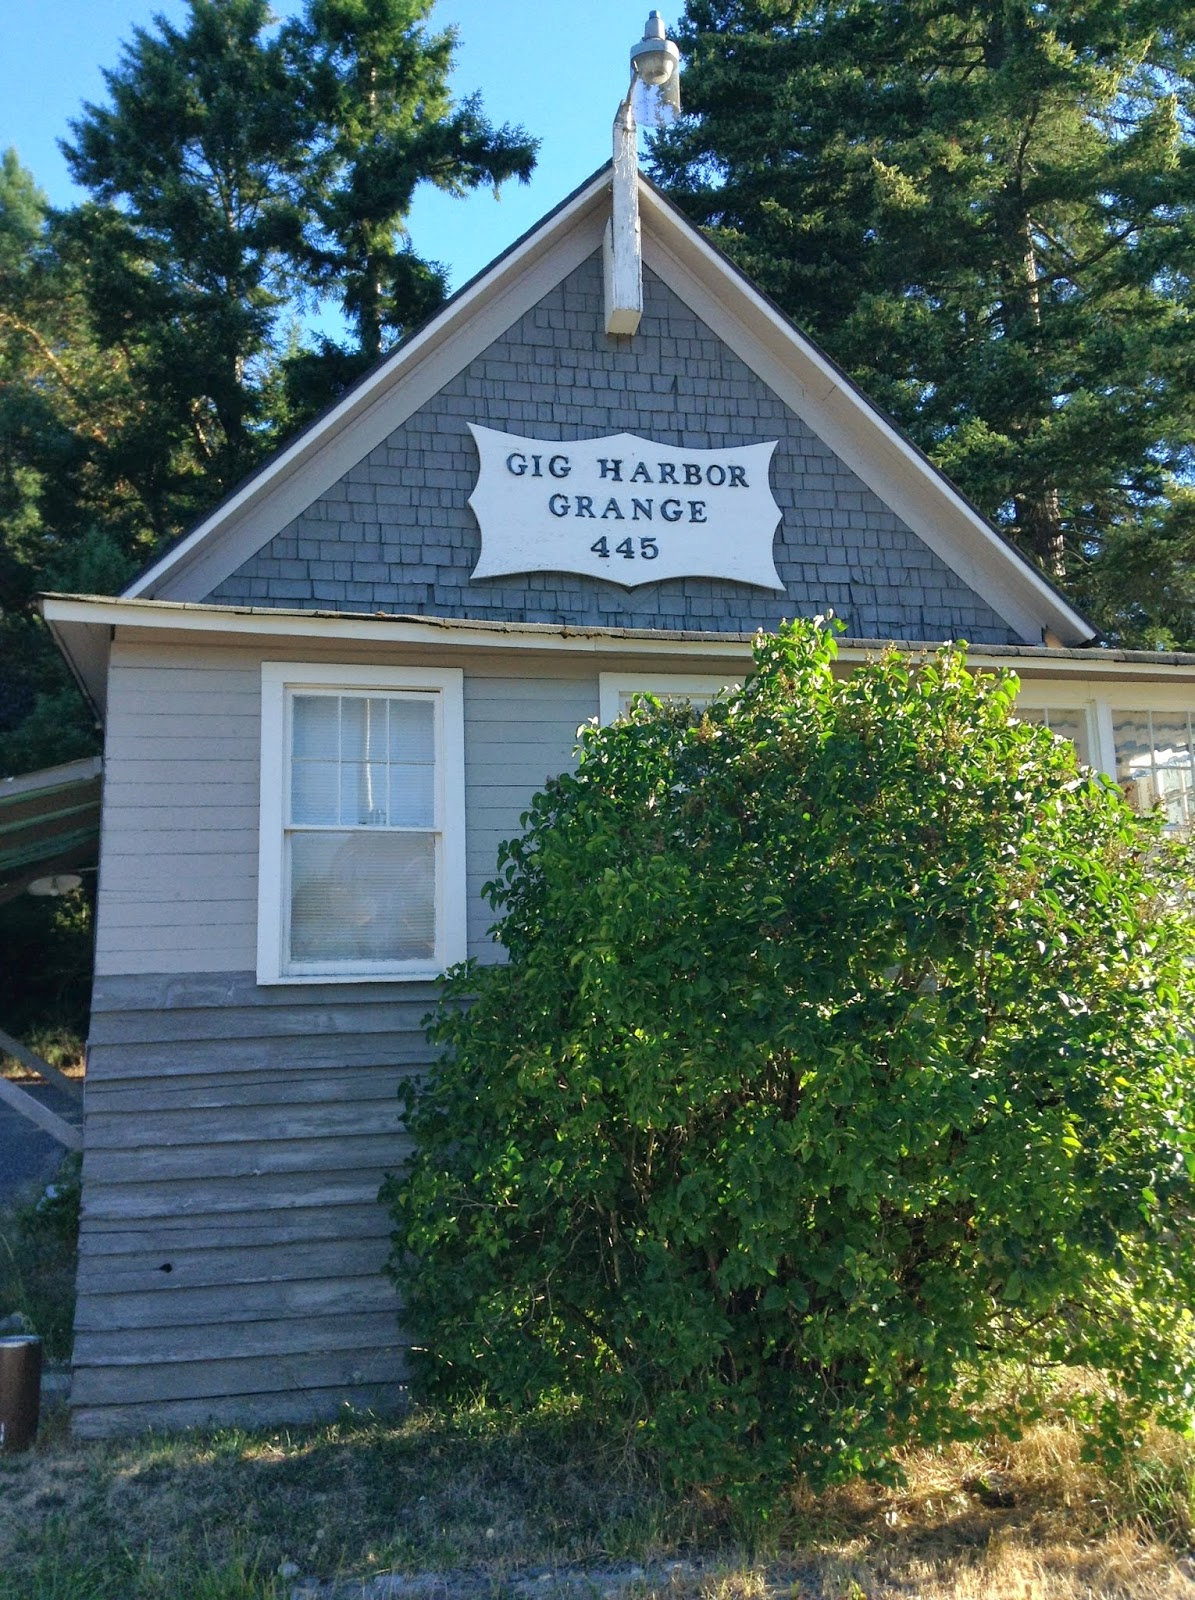 GH Grange #445. u201cu2026 & Harbor History Museum Blog: Gig Harbor Grange No. 445